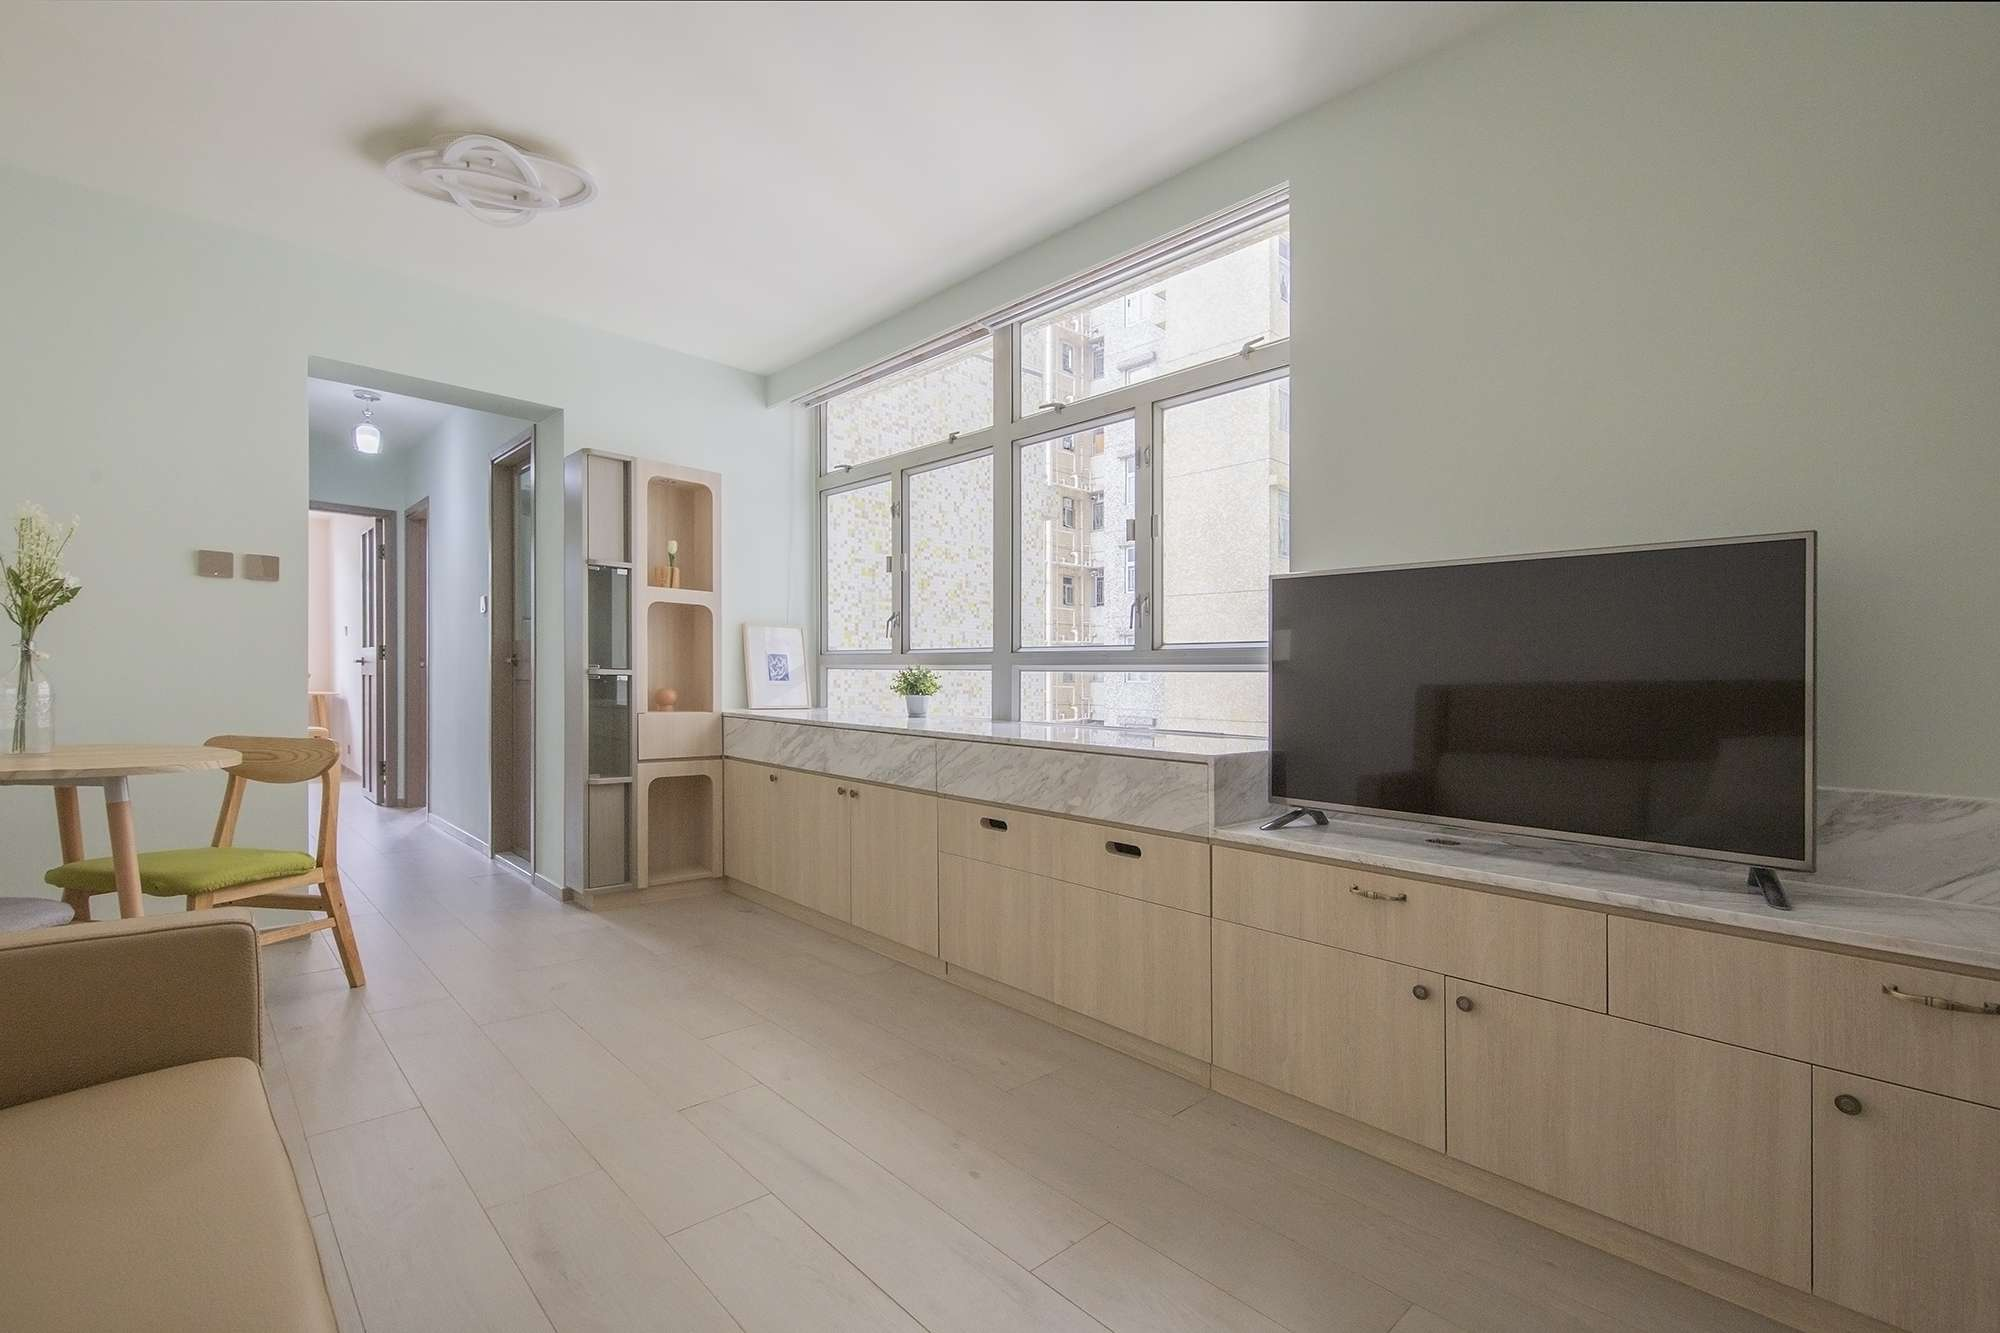 Floral Aged House apartment renovation by Sim-Plex Design Studio living room